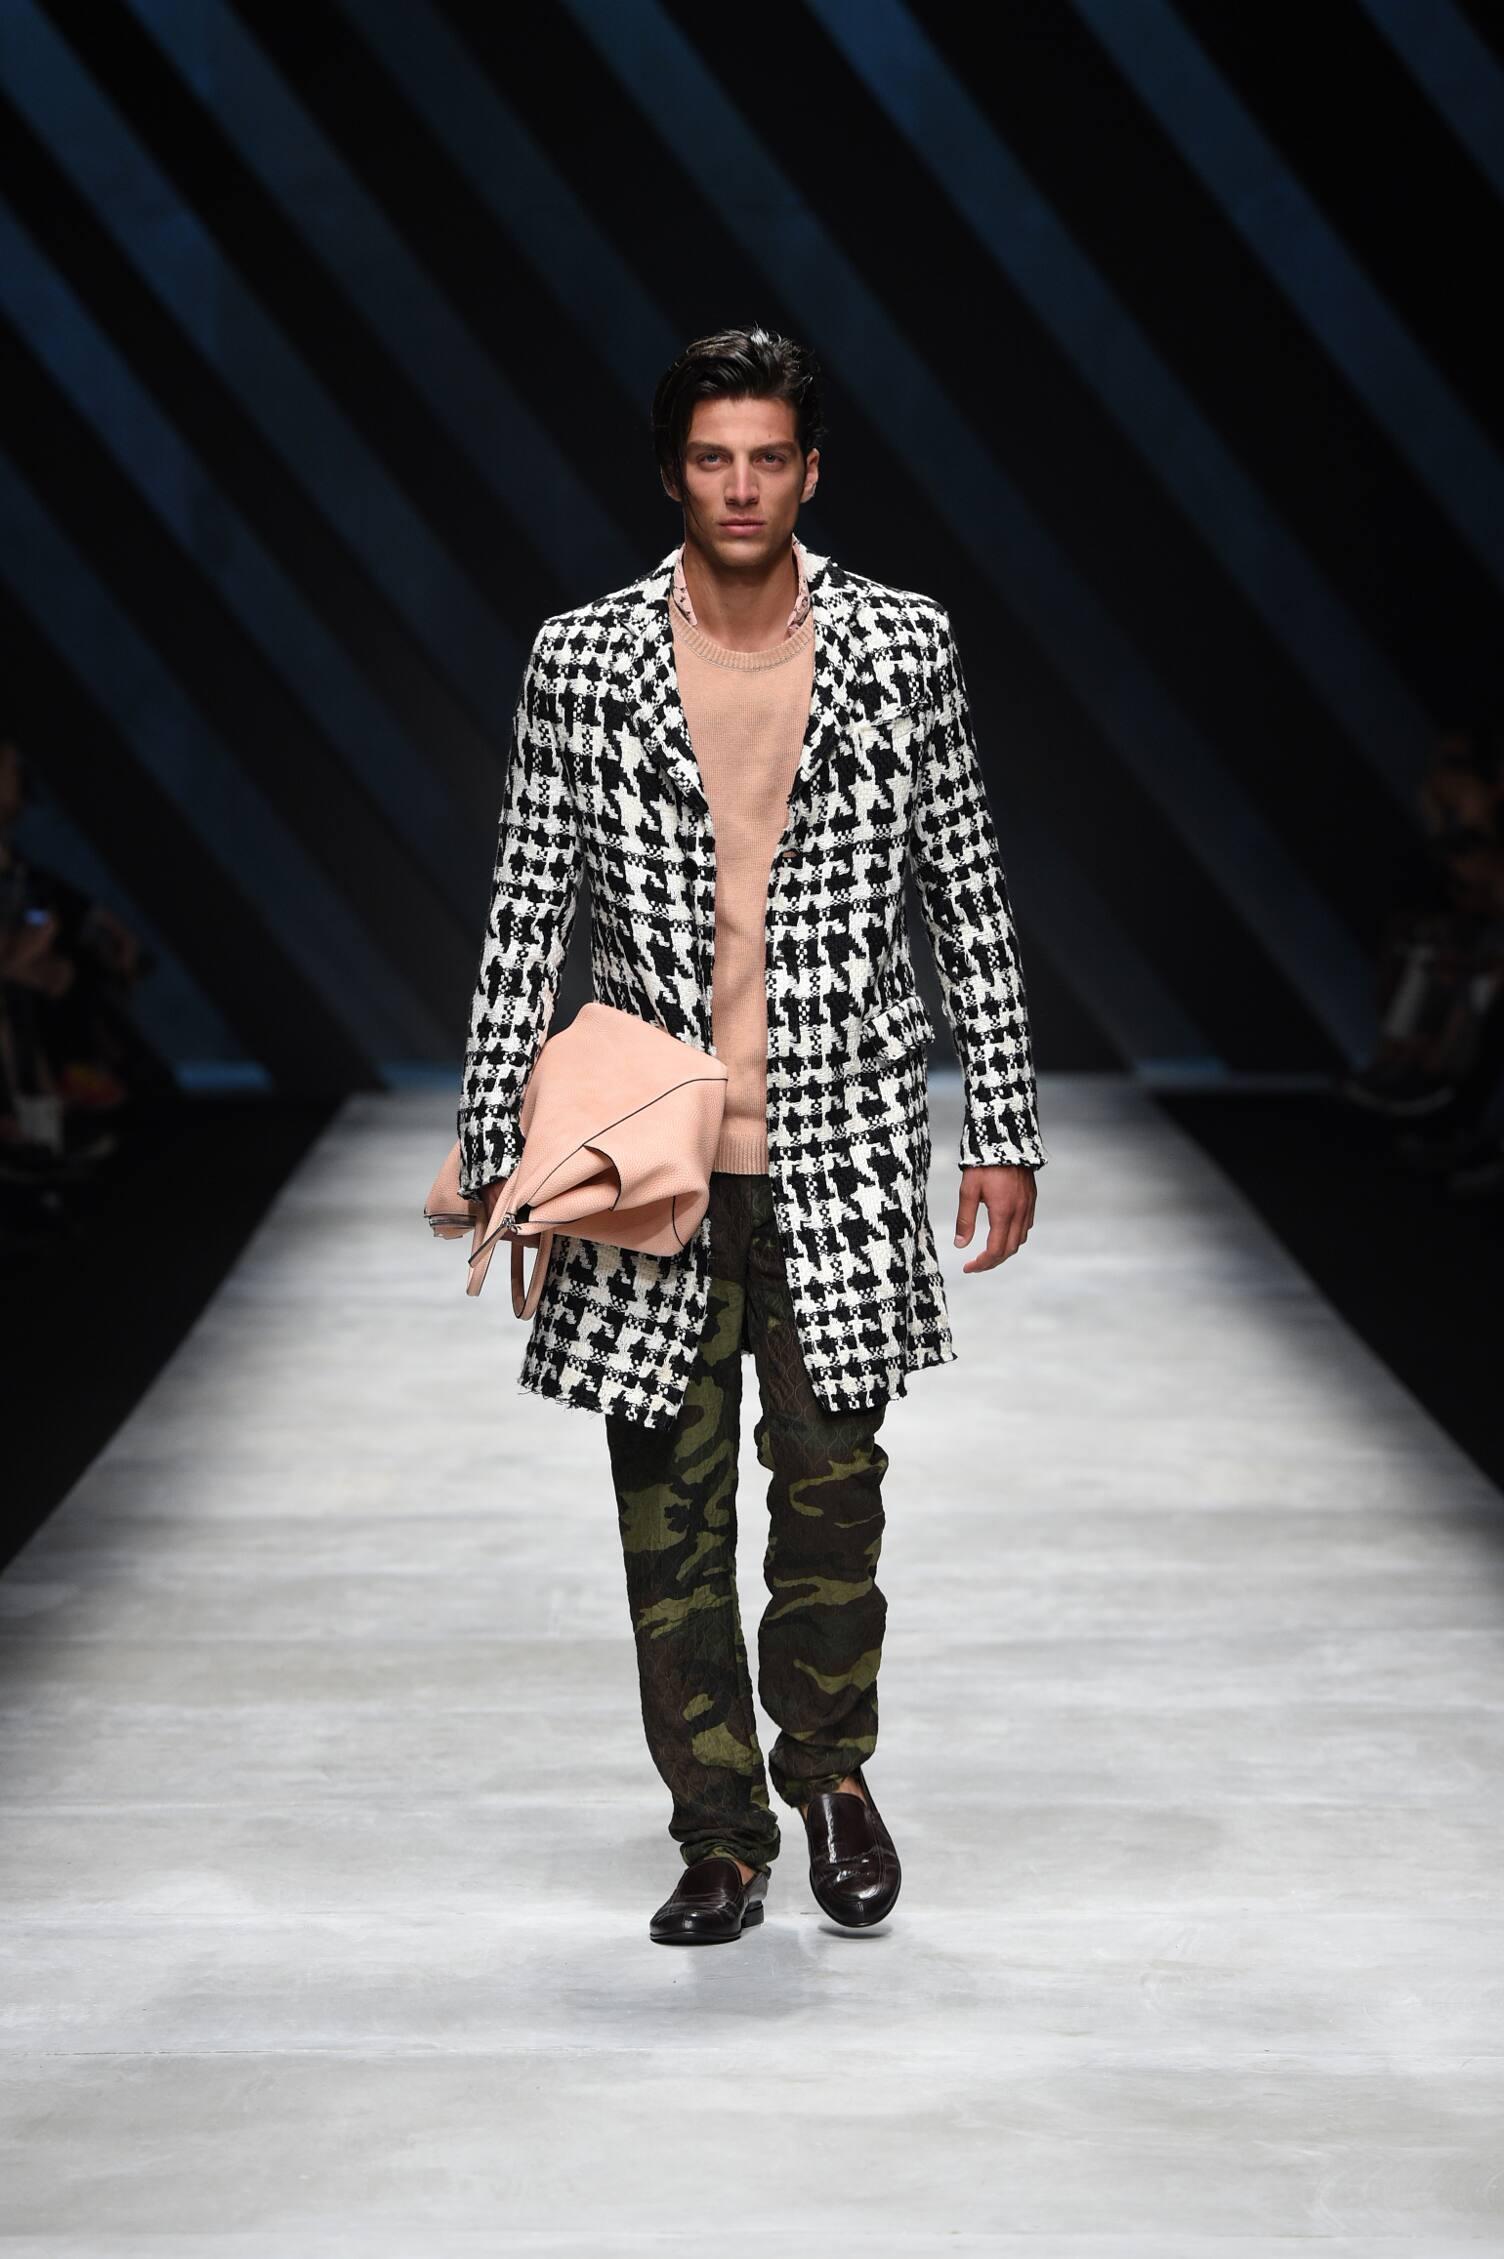 Spring Fashion Man Ermanno Scervino Collection